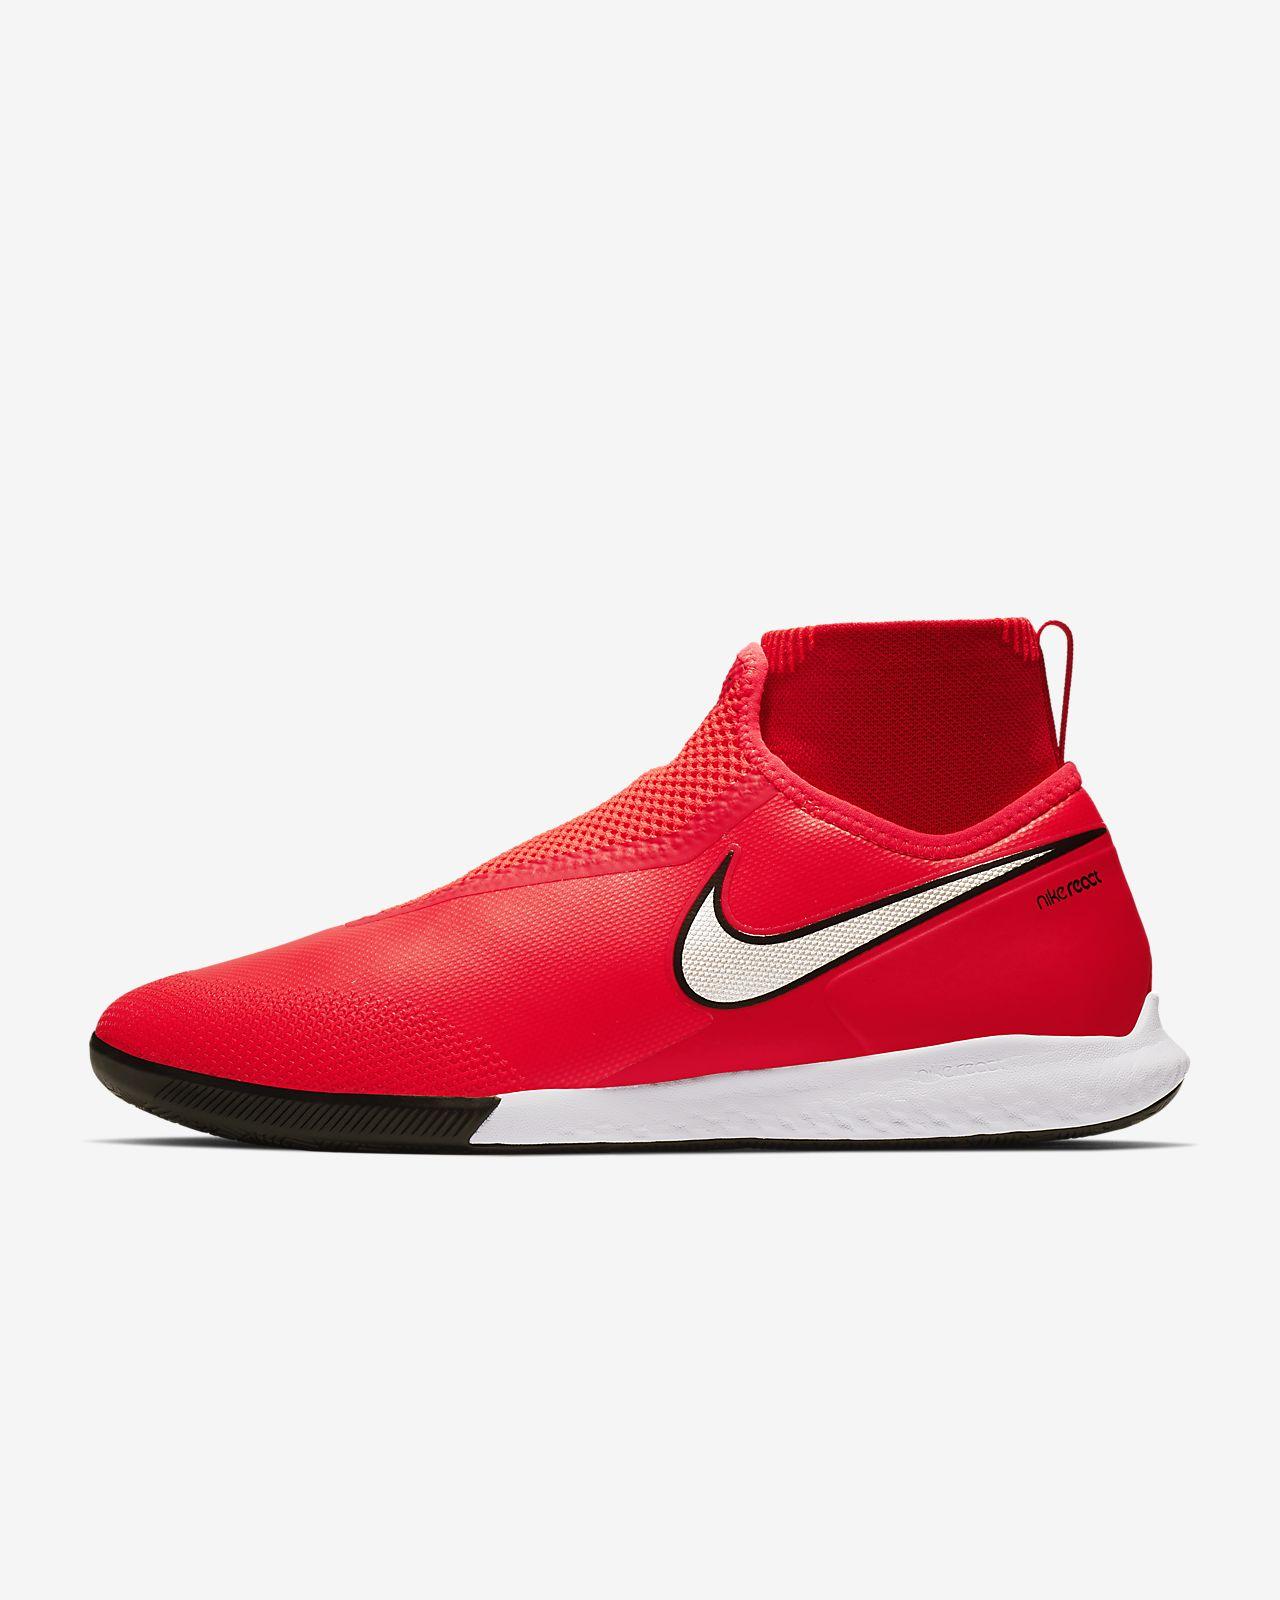 d6e033d8d68 ... Nike React PhantomVSN Pro Dynamic Fit Game Over IC Fußballschuh für  Hallen- und Hartplätze